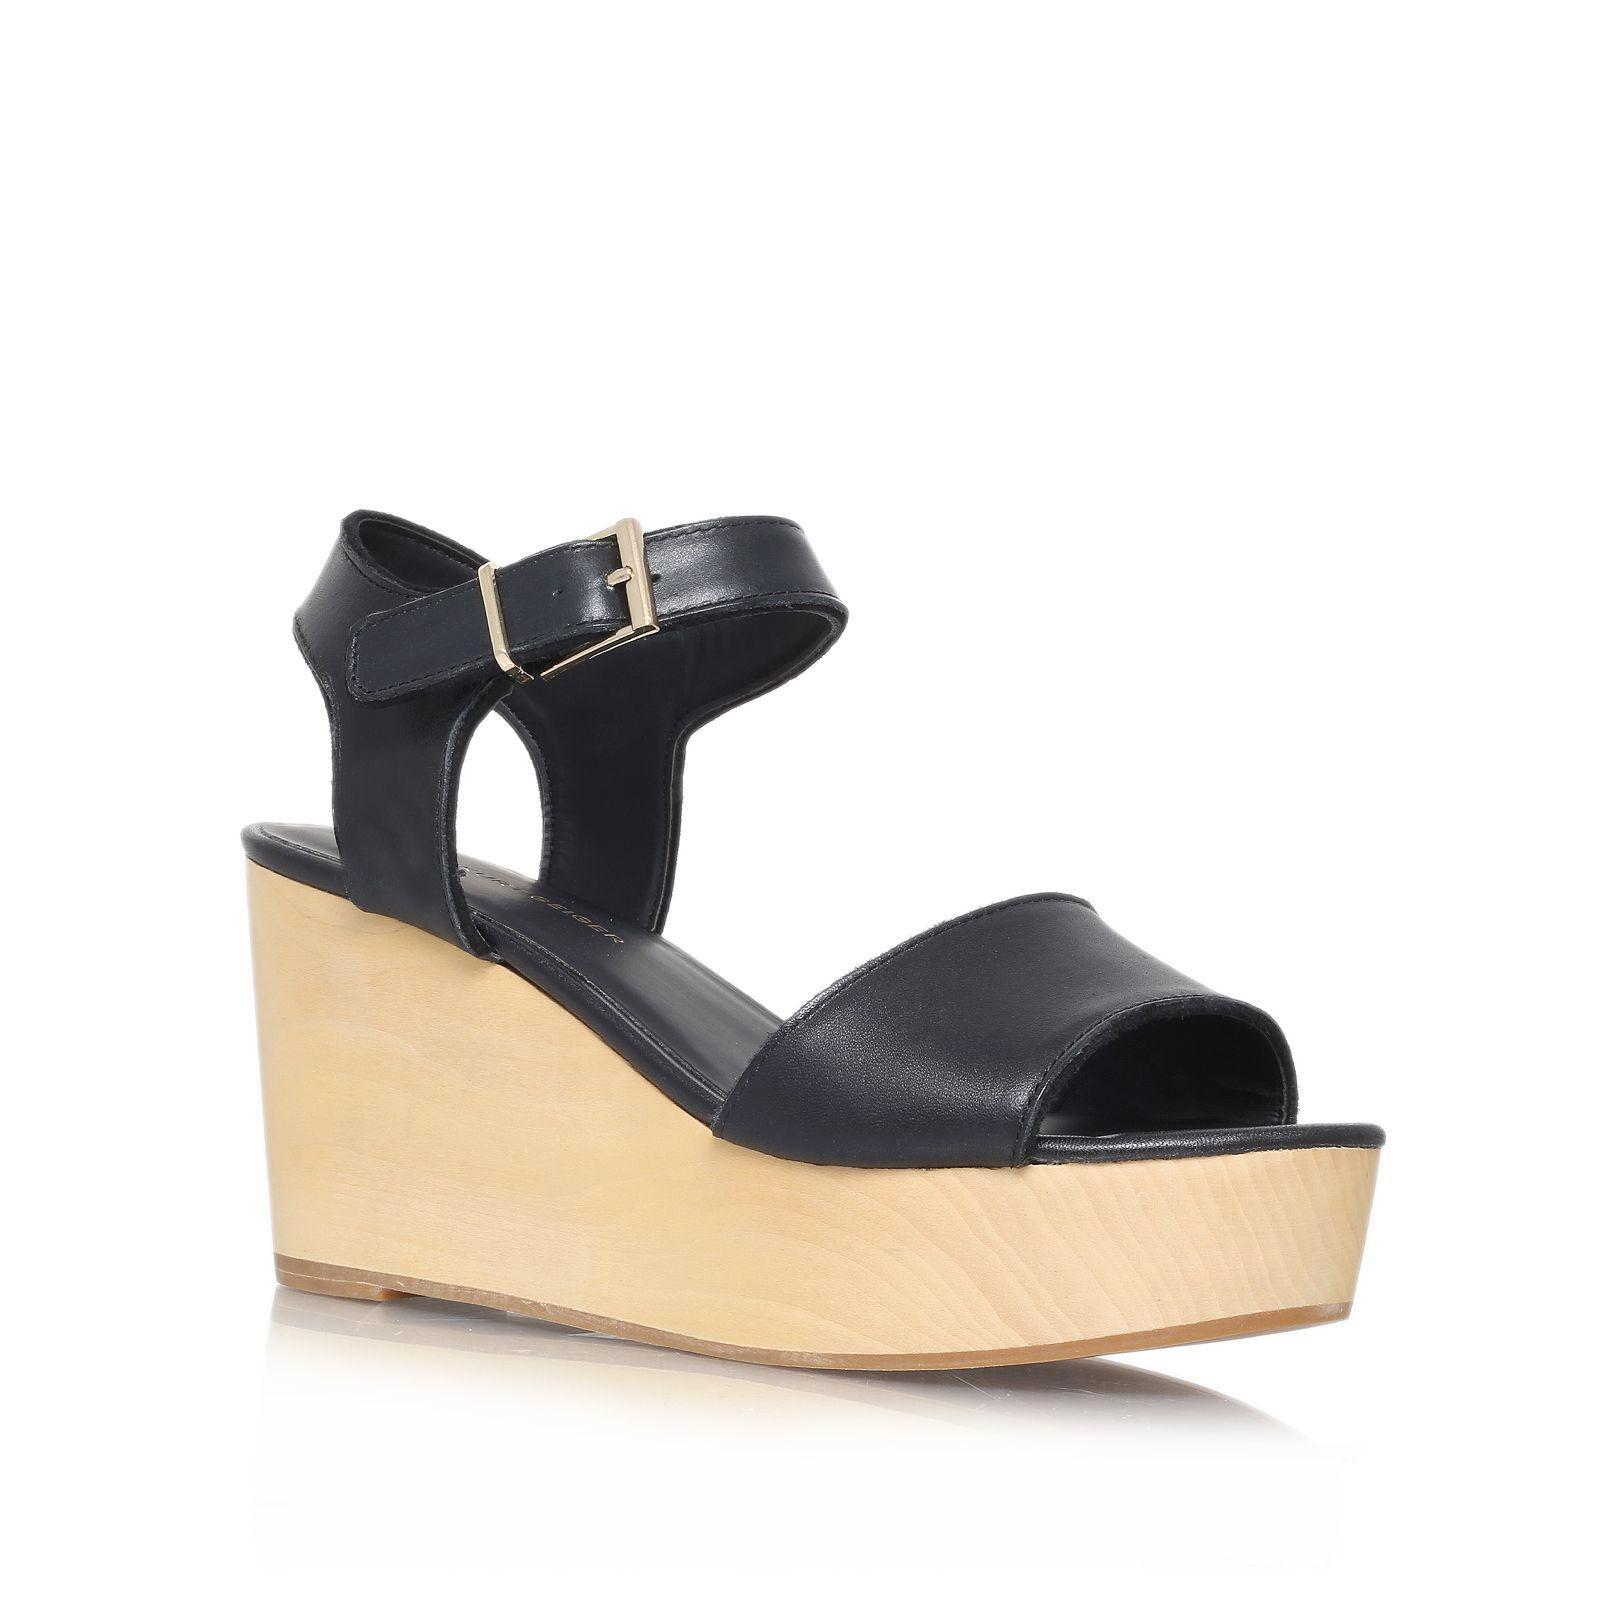 kg kurt geiger nia high heel wedge sandals in black lyst